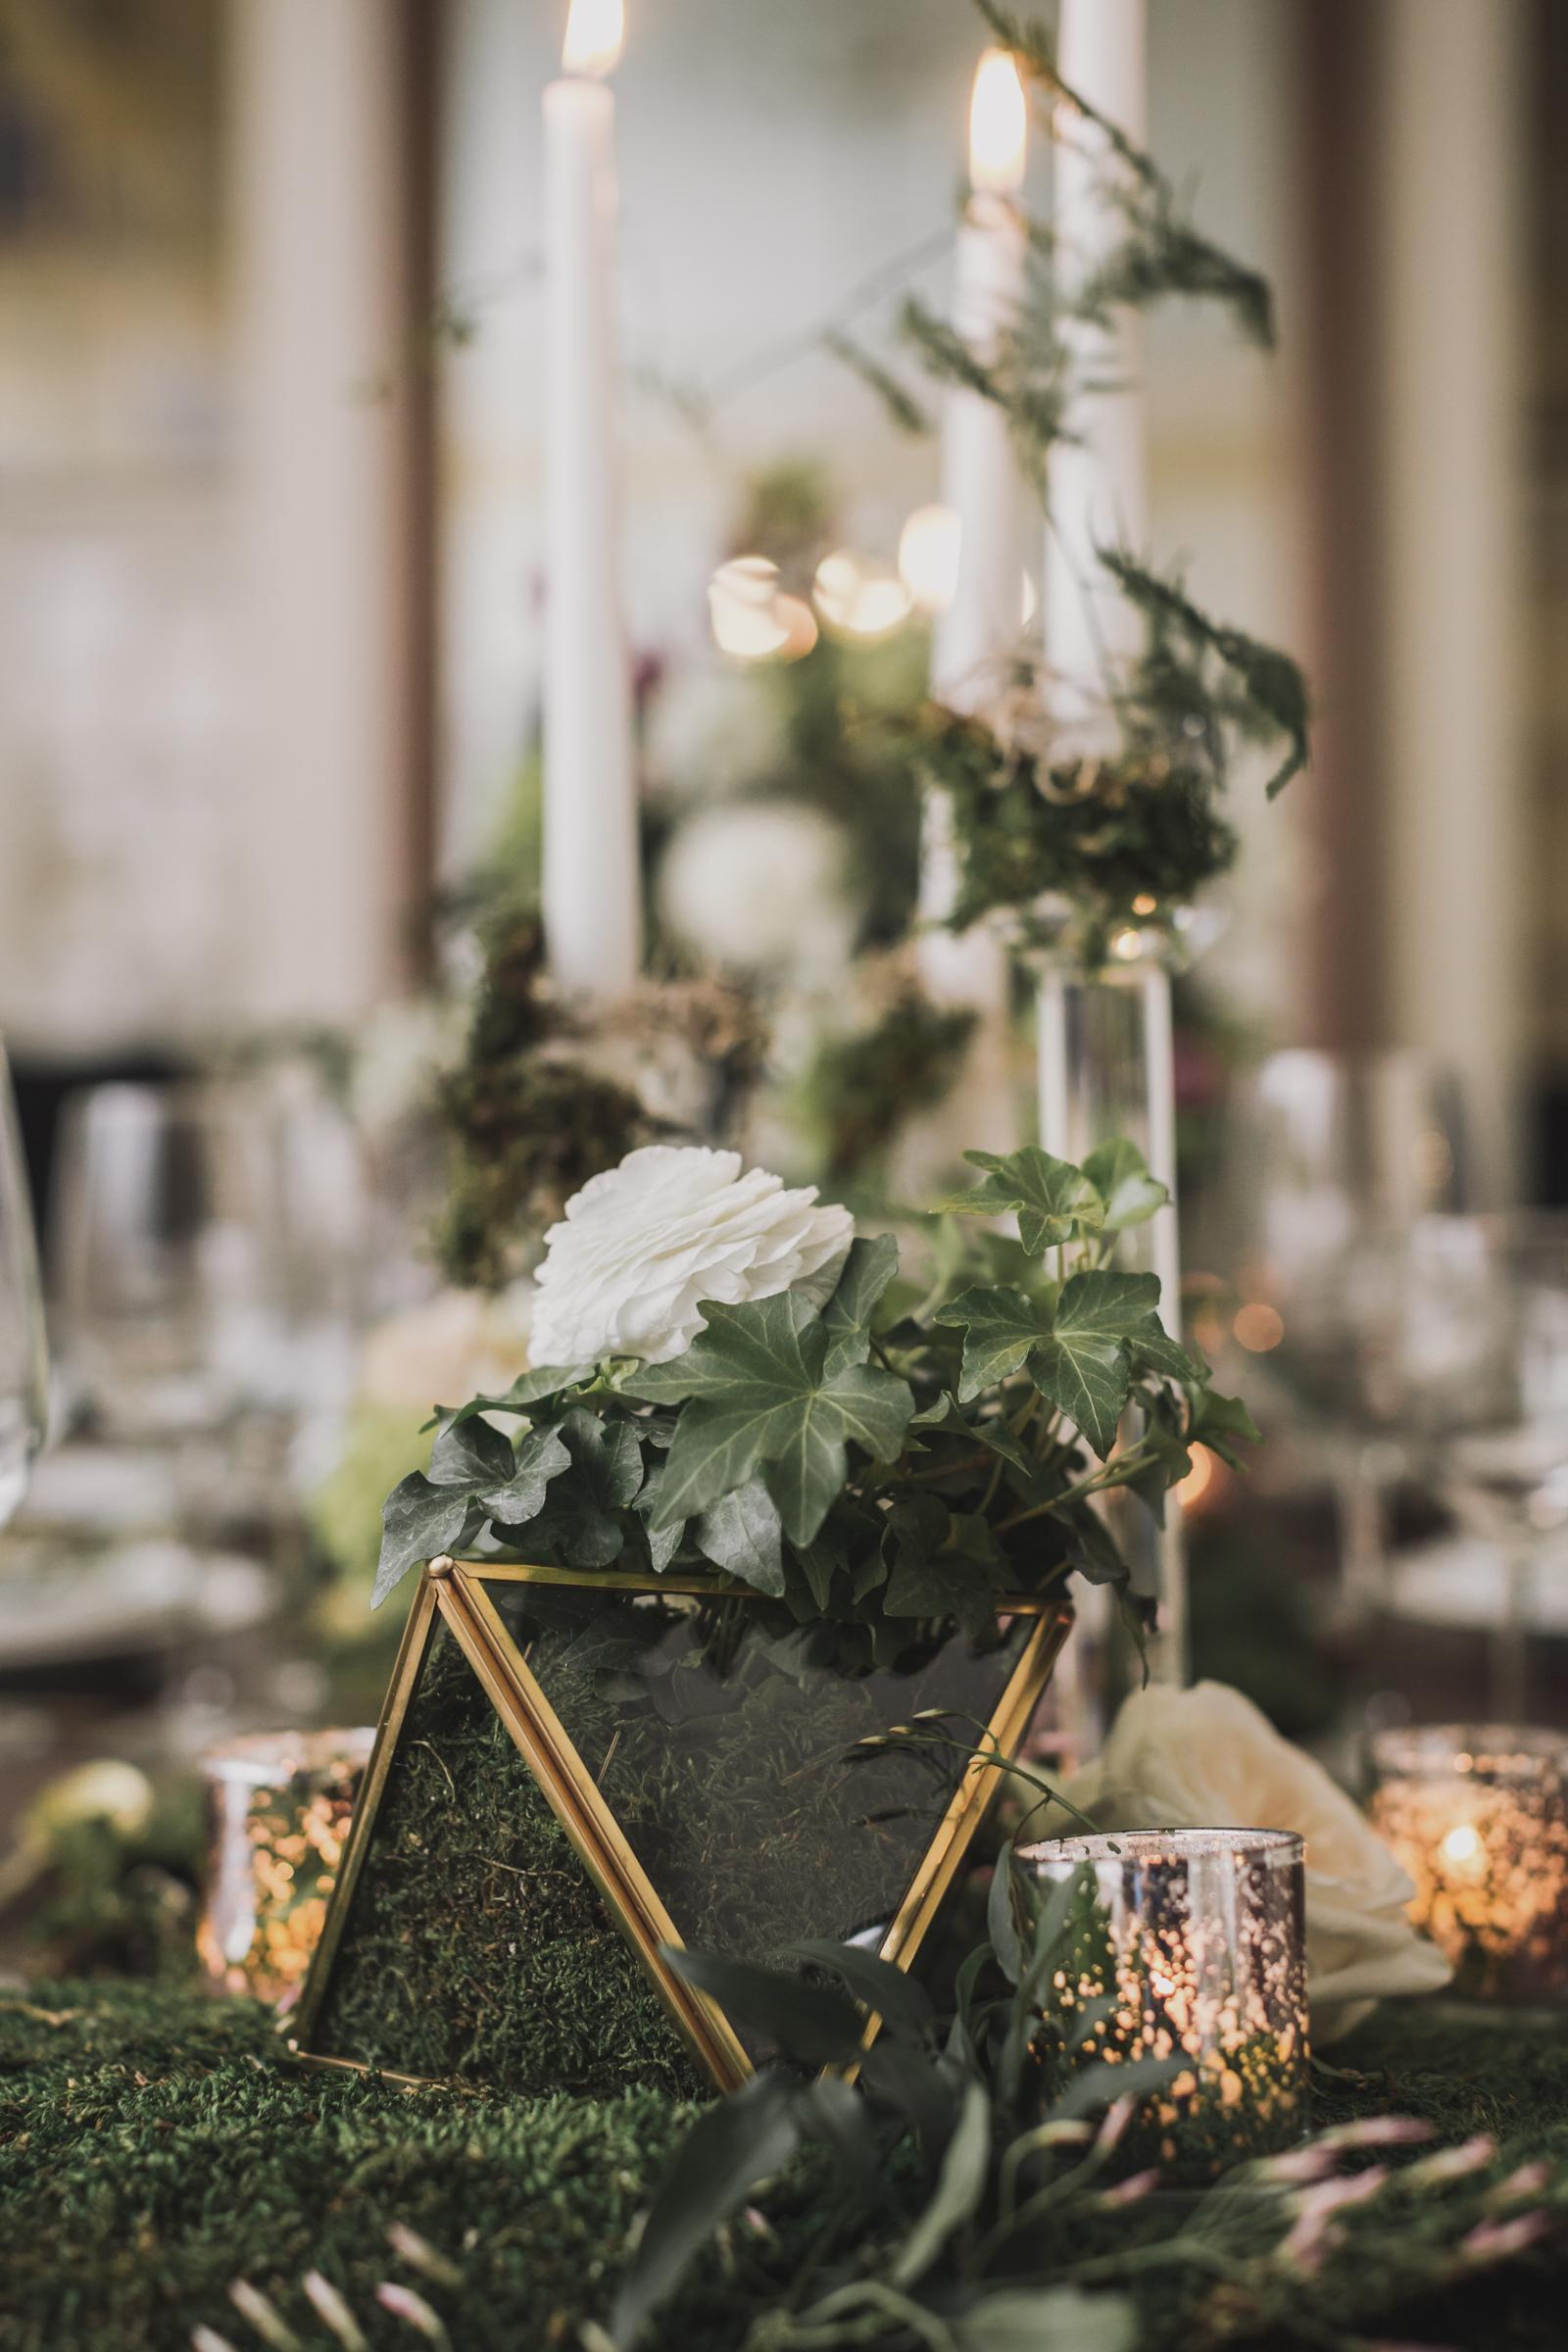 20160310-123-Barrow_Mansion_Wedding_Editorial.jpg